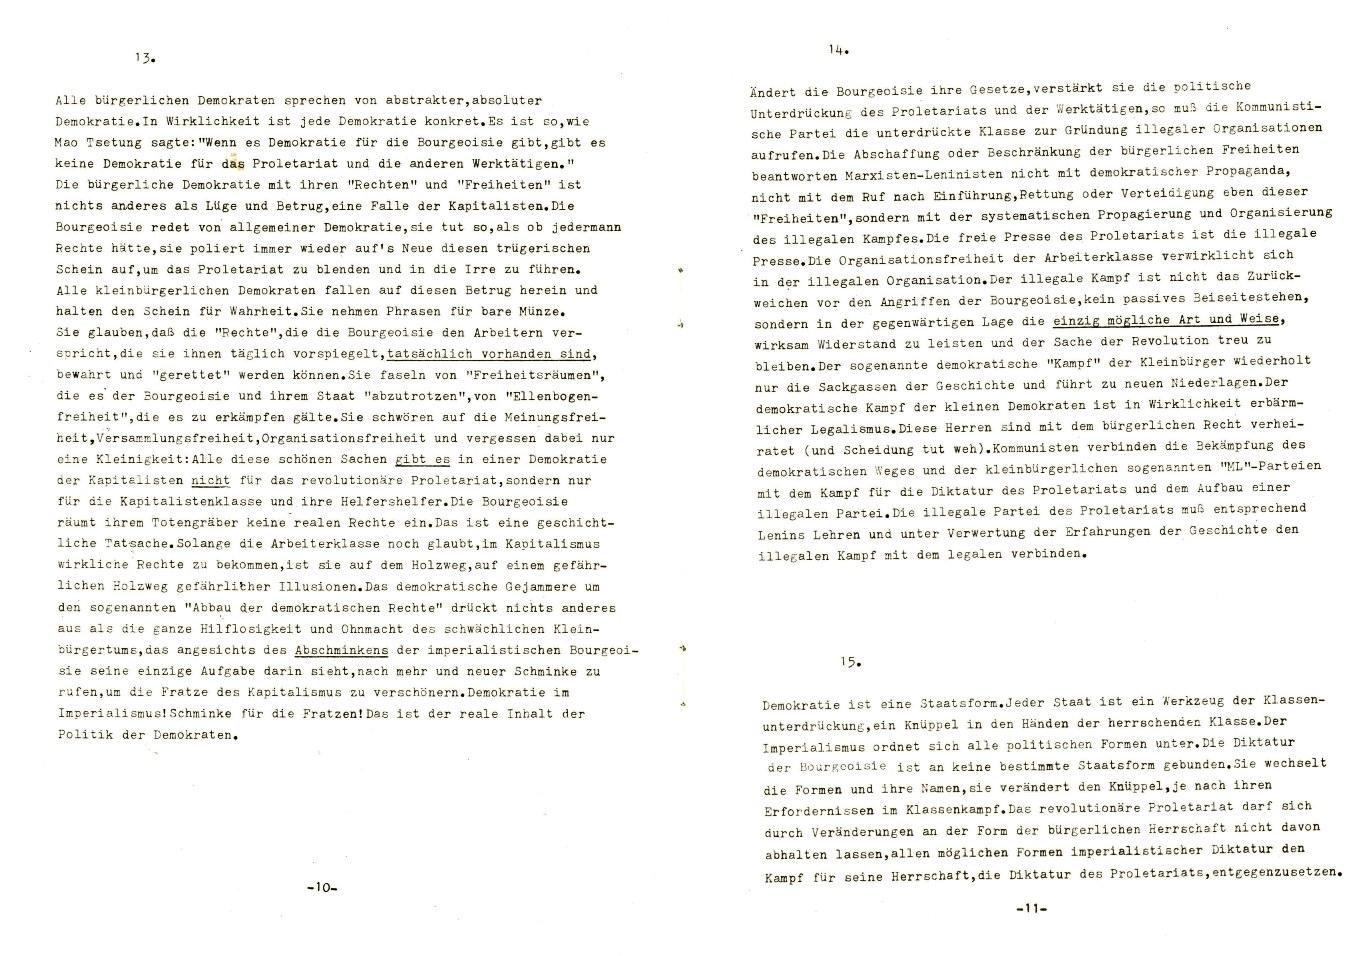 Muenchen_Kampf_dem_Revisionismus_1978_06_06